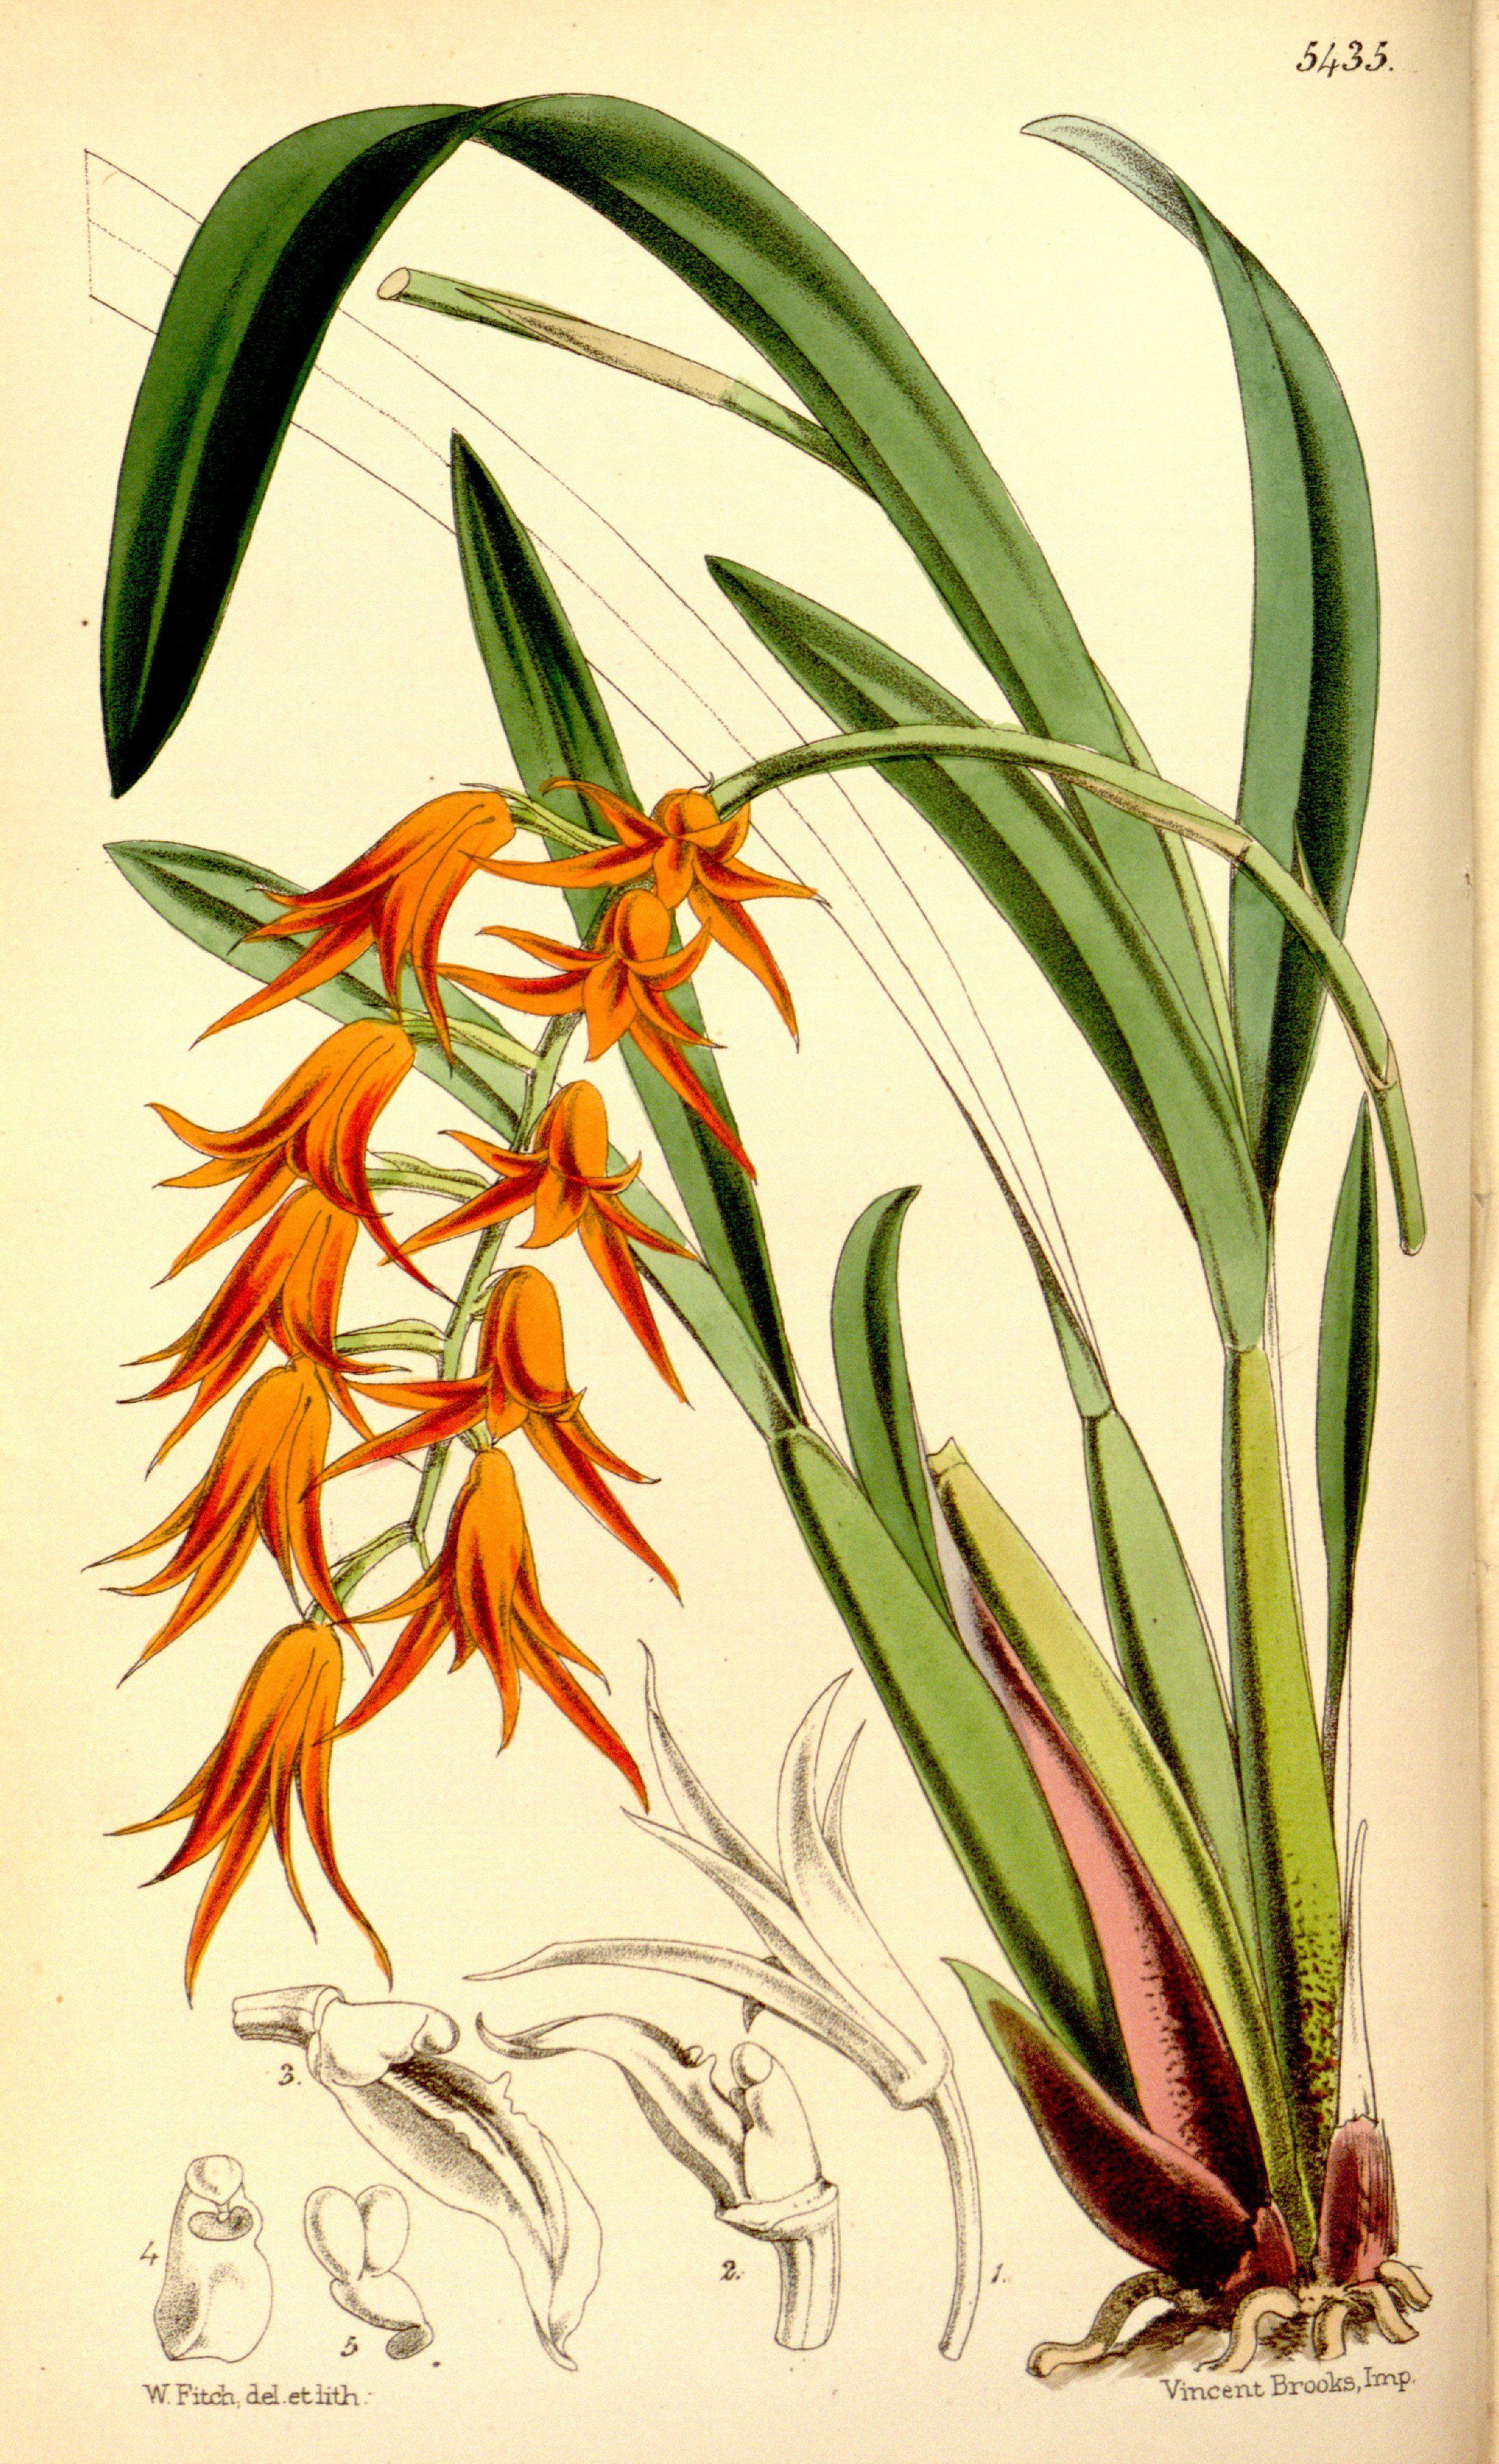 Botanical Illustration Of Ada Aurantiaca Featuring Bright Orange Flowers